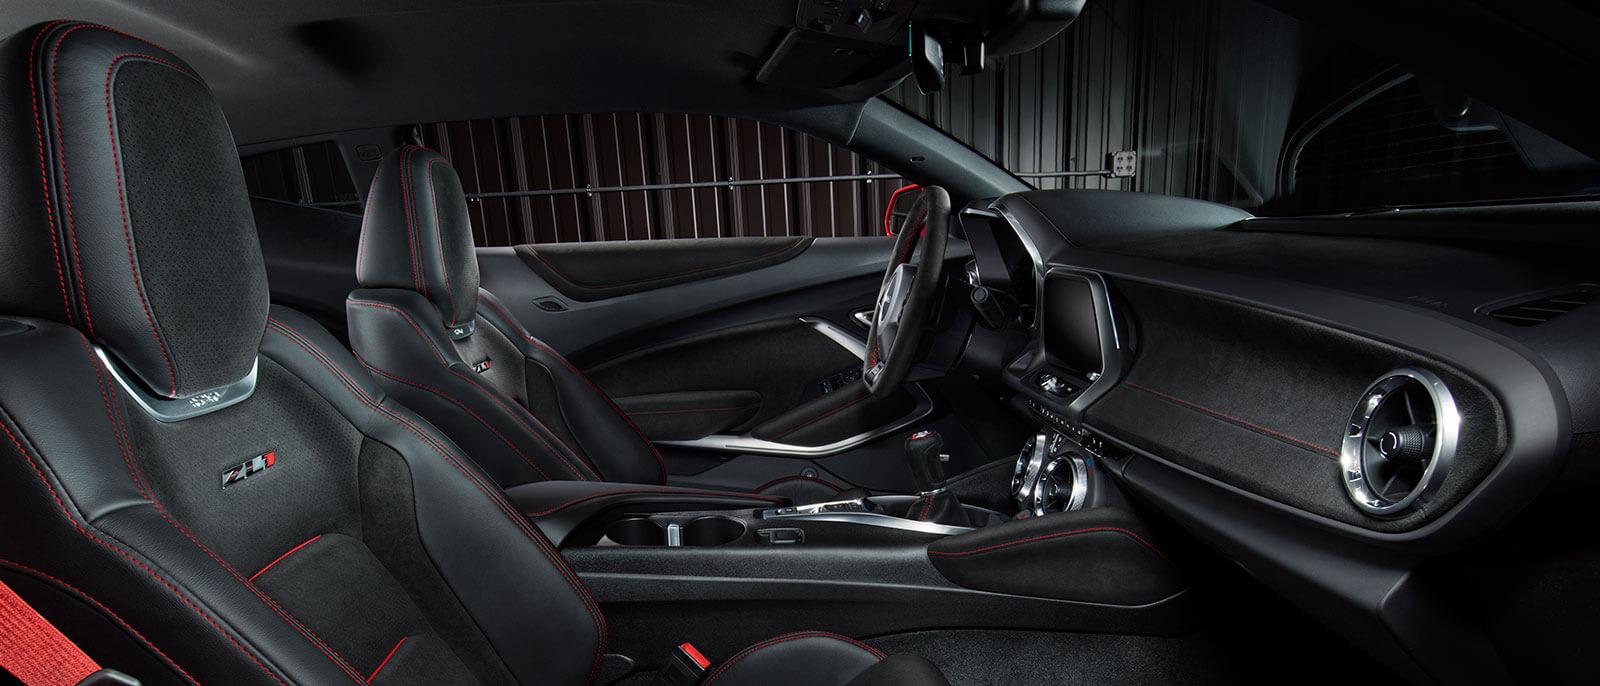 2017 Chevrolet Camaro interior